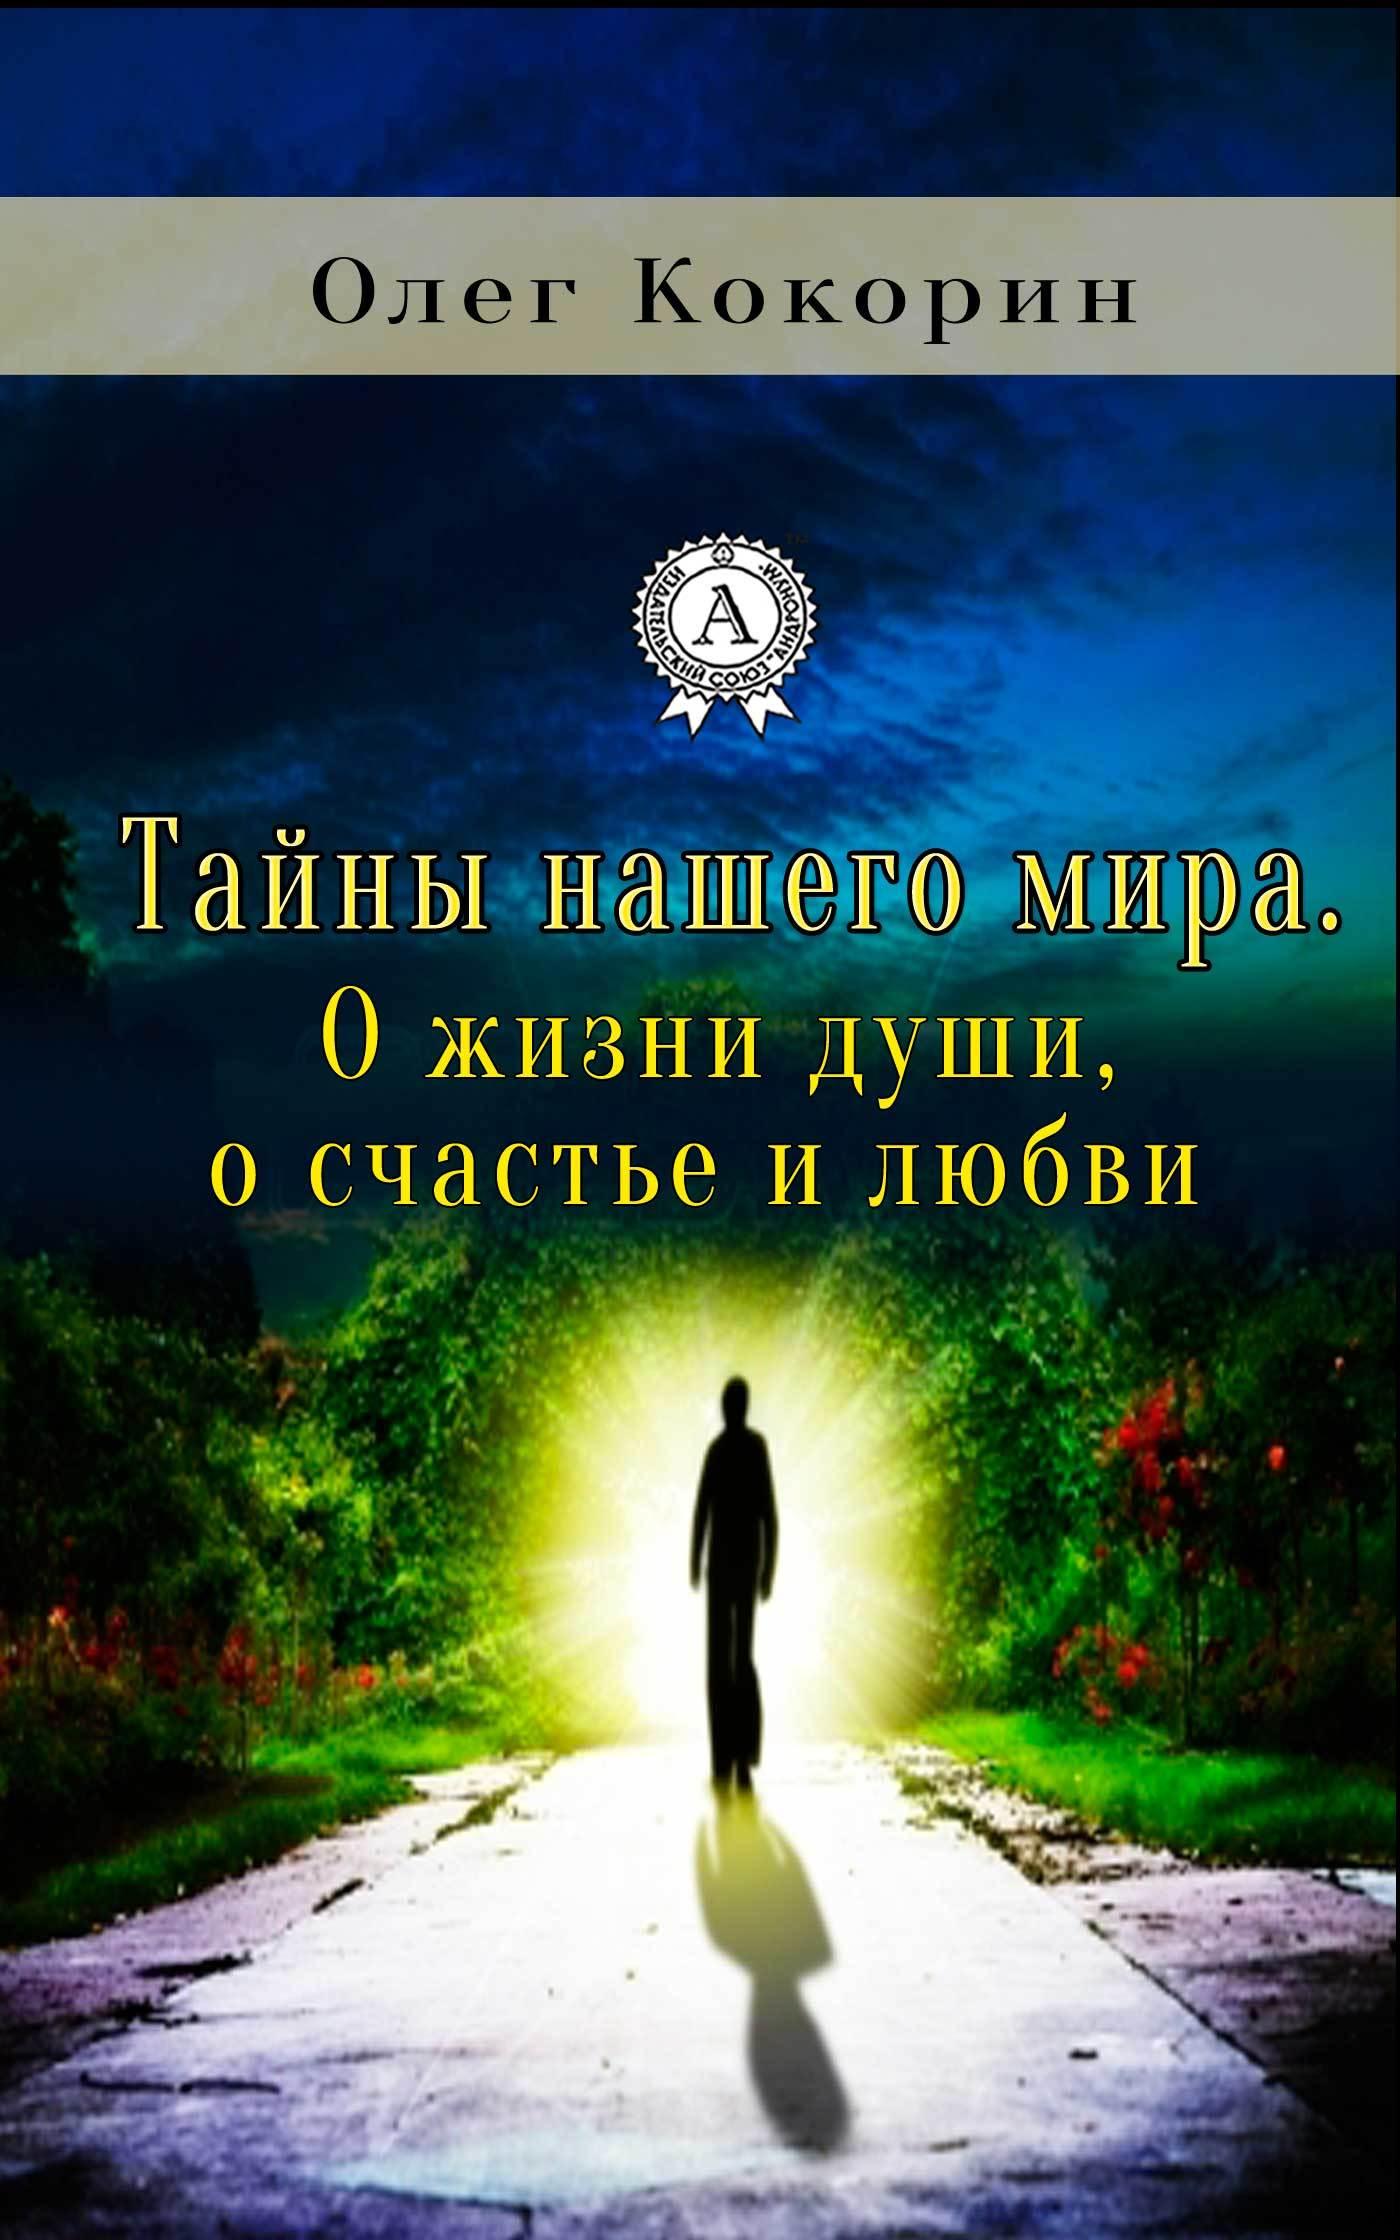 Олег Кокорин бесплатно